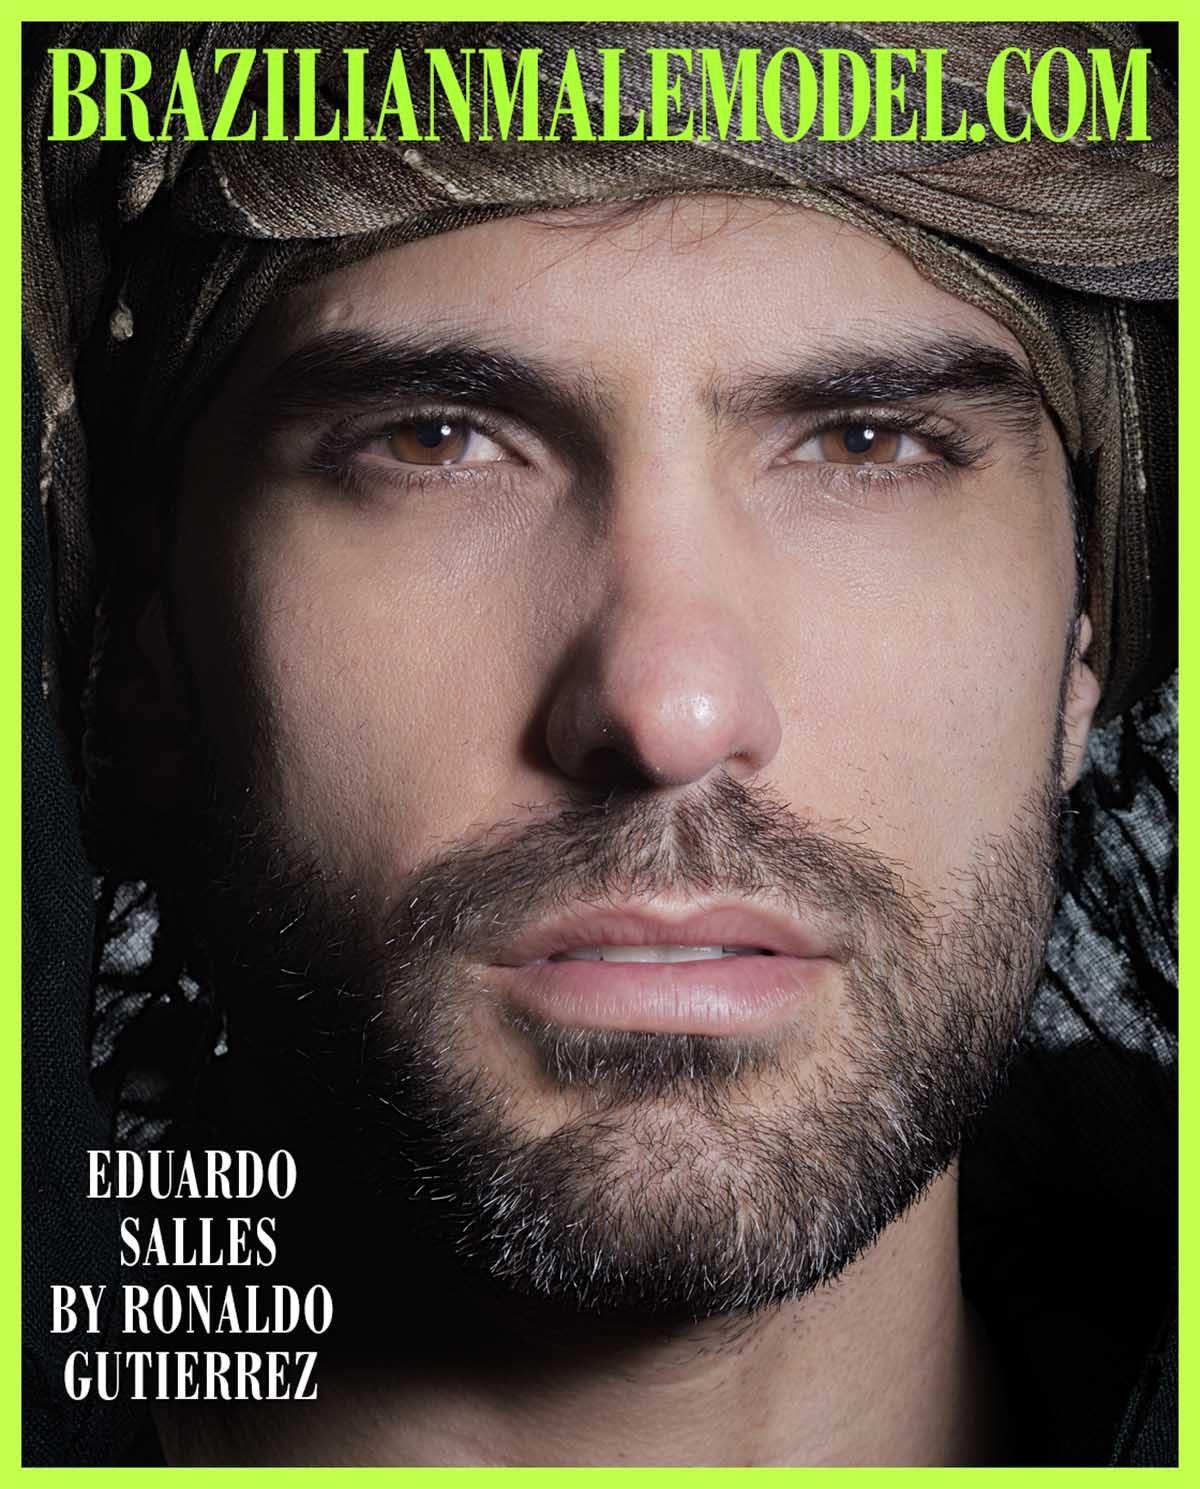 Eduardo Salles by Ronaldo Gutierrez